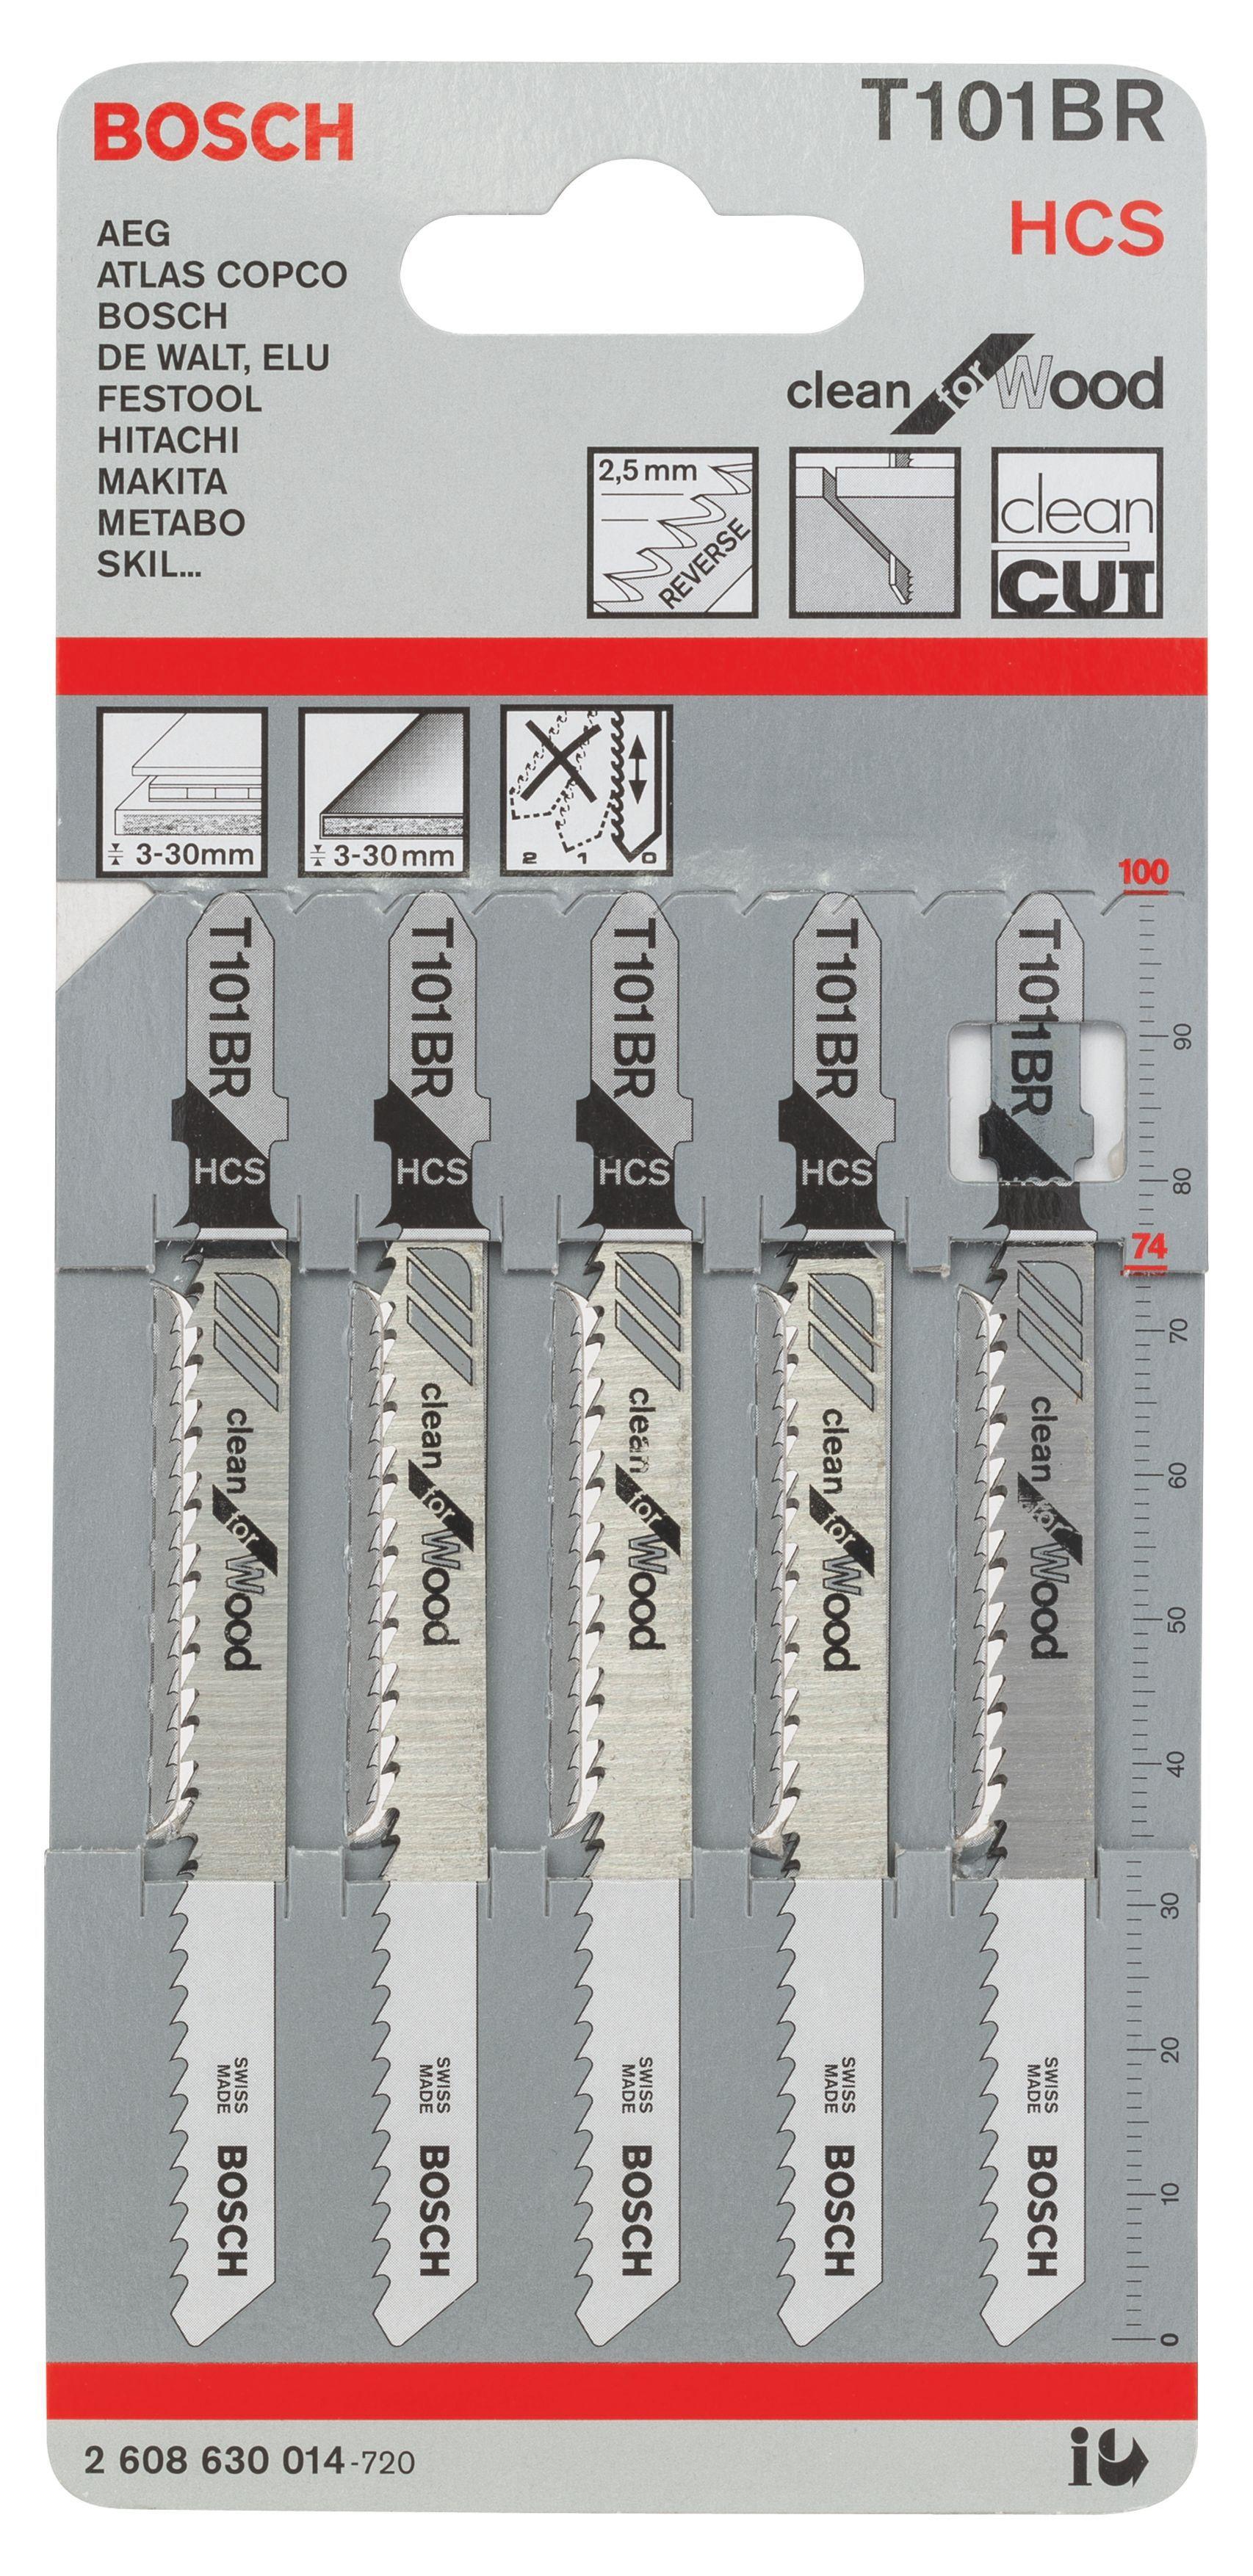 Bosch Bayonet Fitting Jigsaw Blade T101br 74mm, Pack Of 5